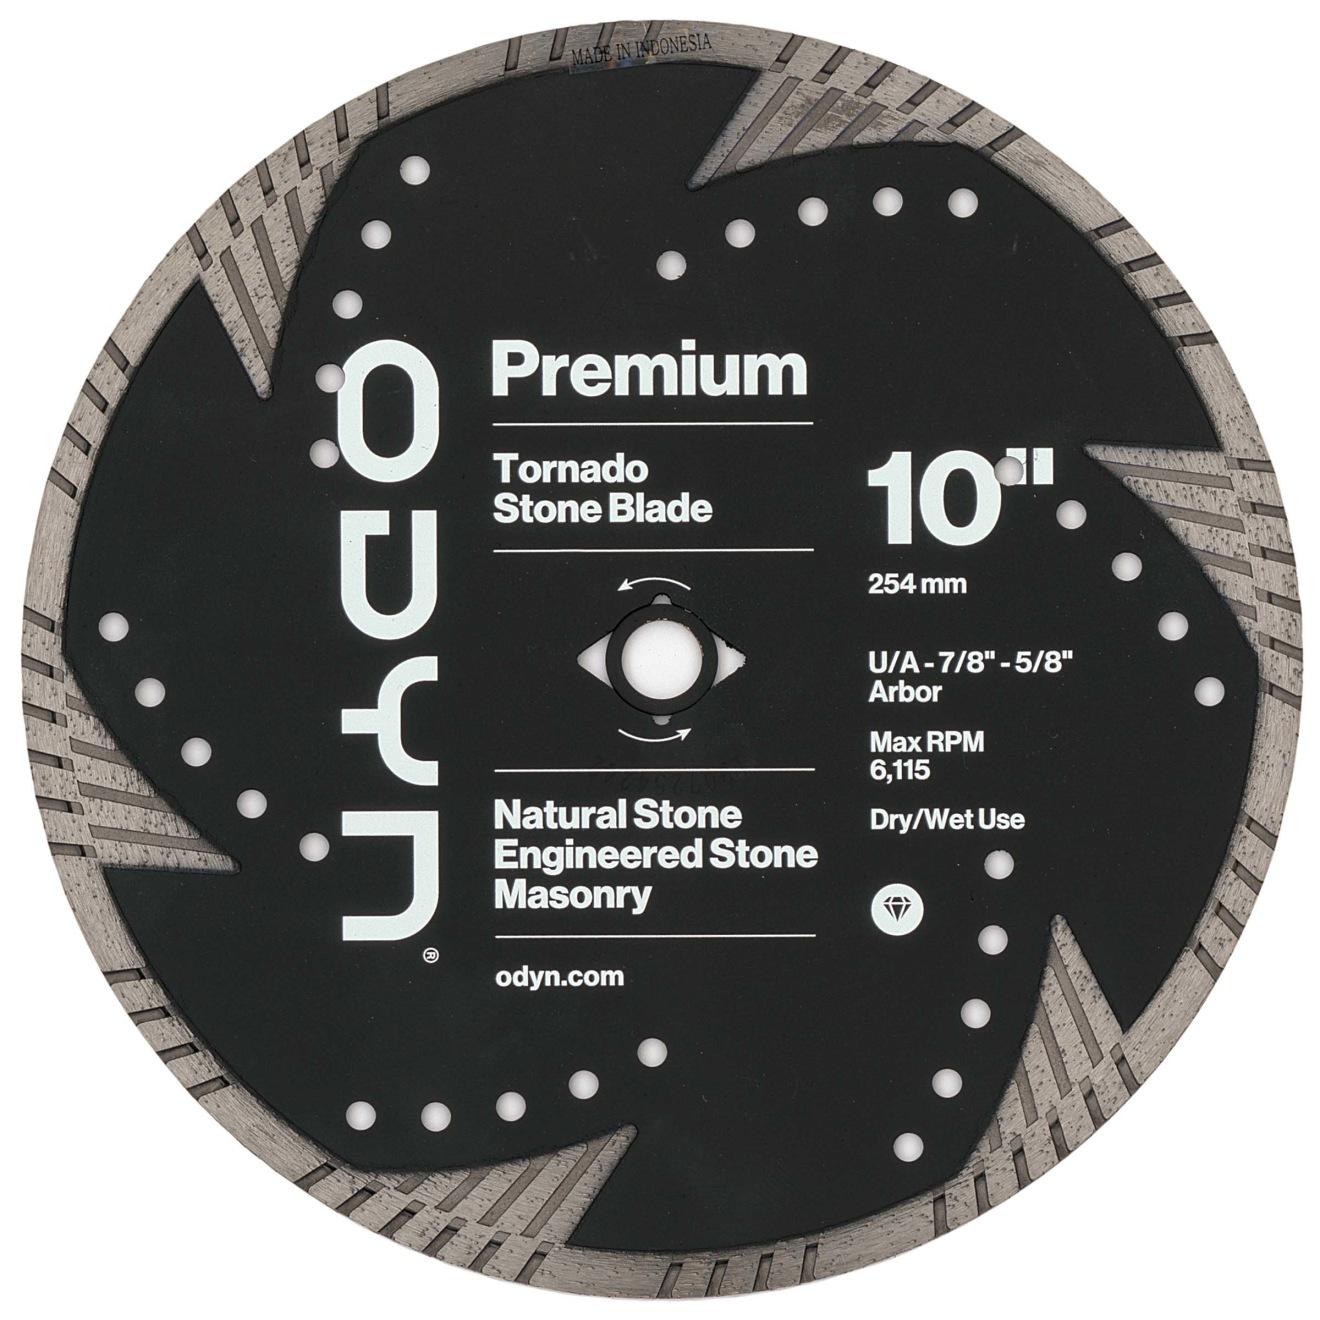 Odyn 10 in. Premium Tornado Stone Blade